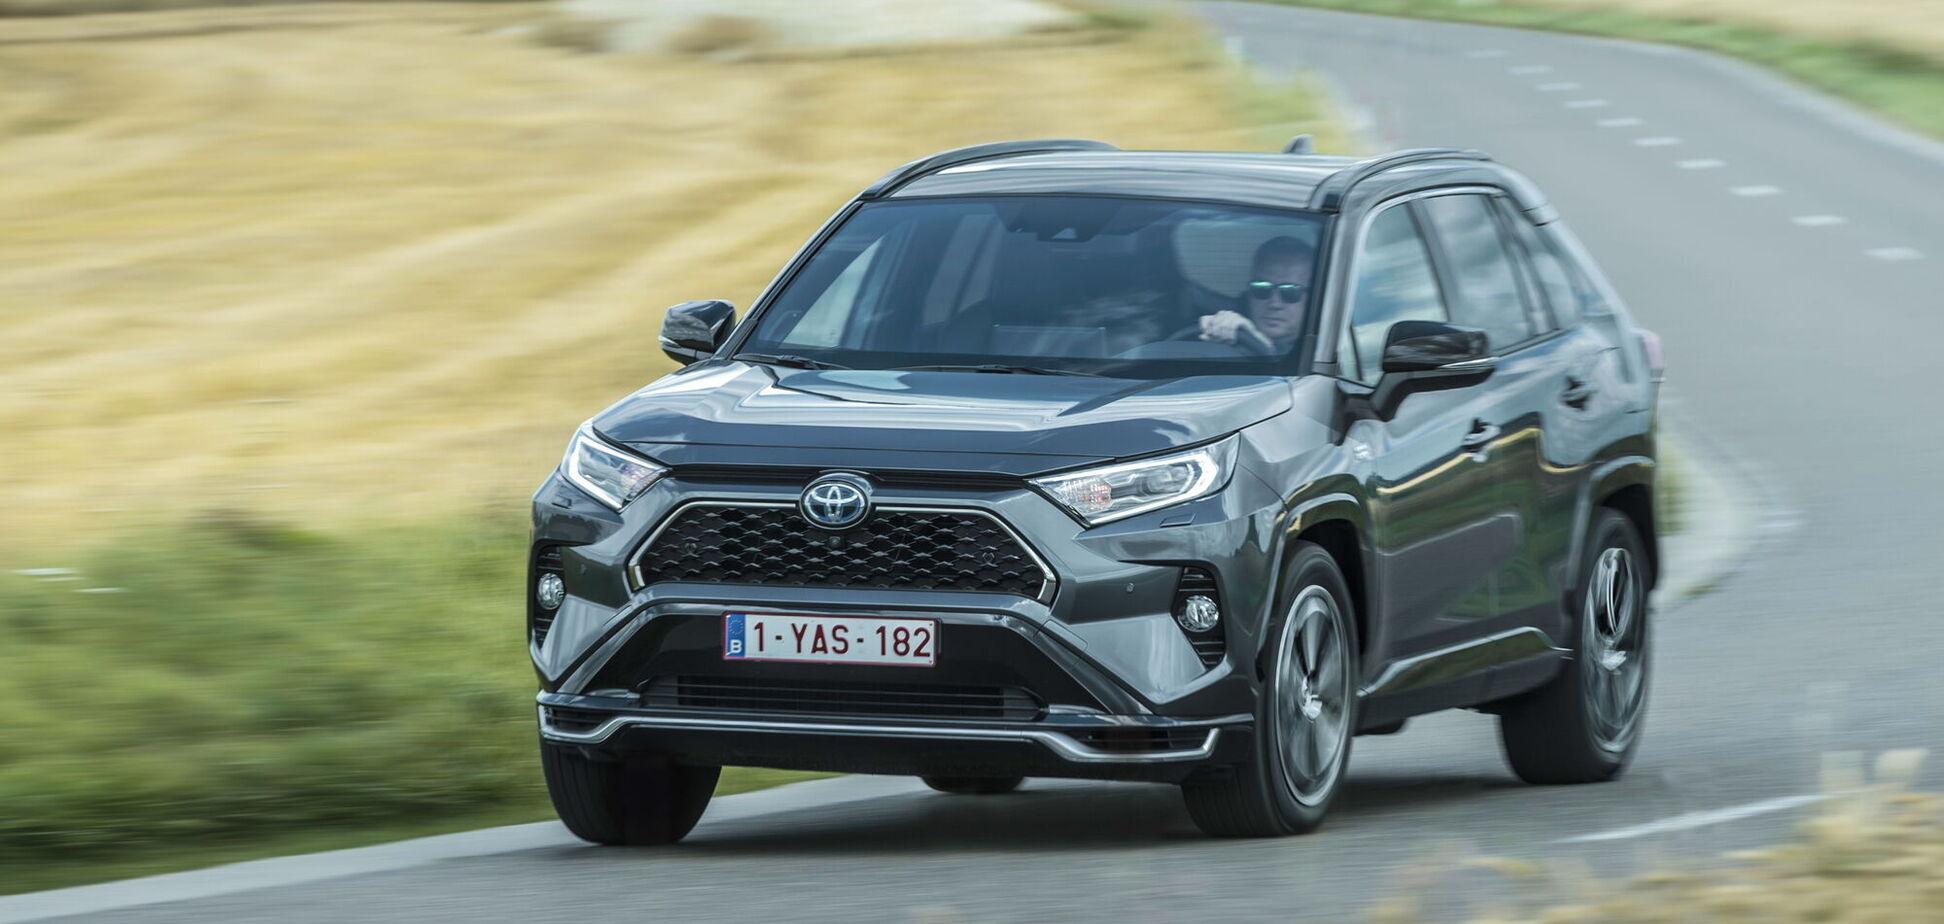 Український ринок нових легкових авто скоротився на 3%